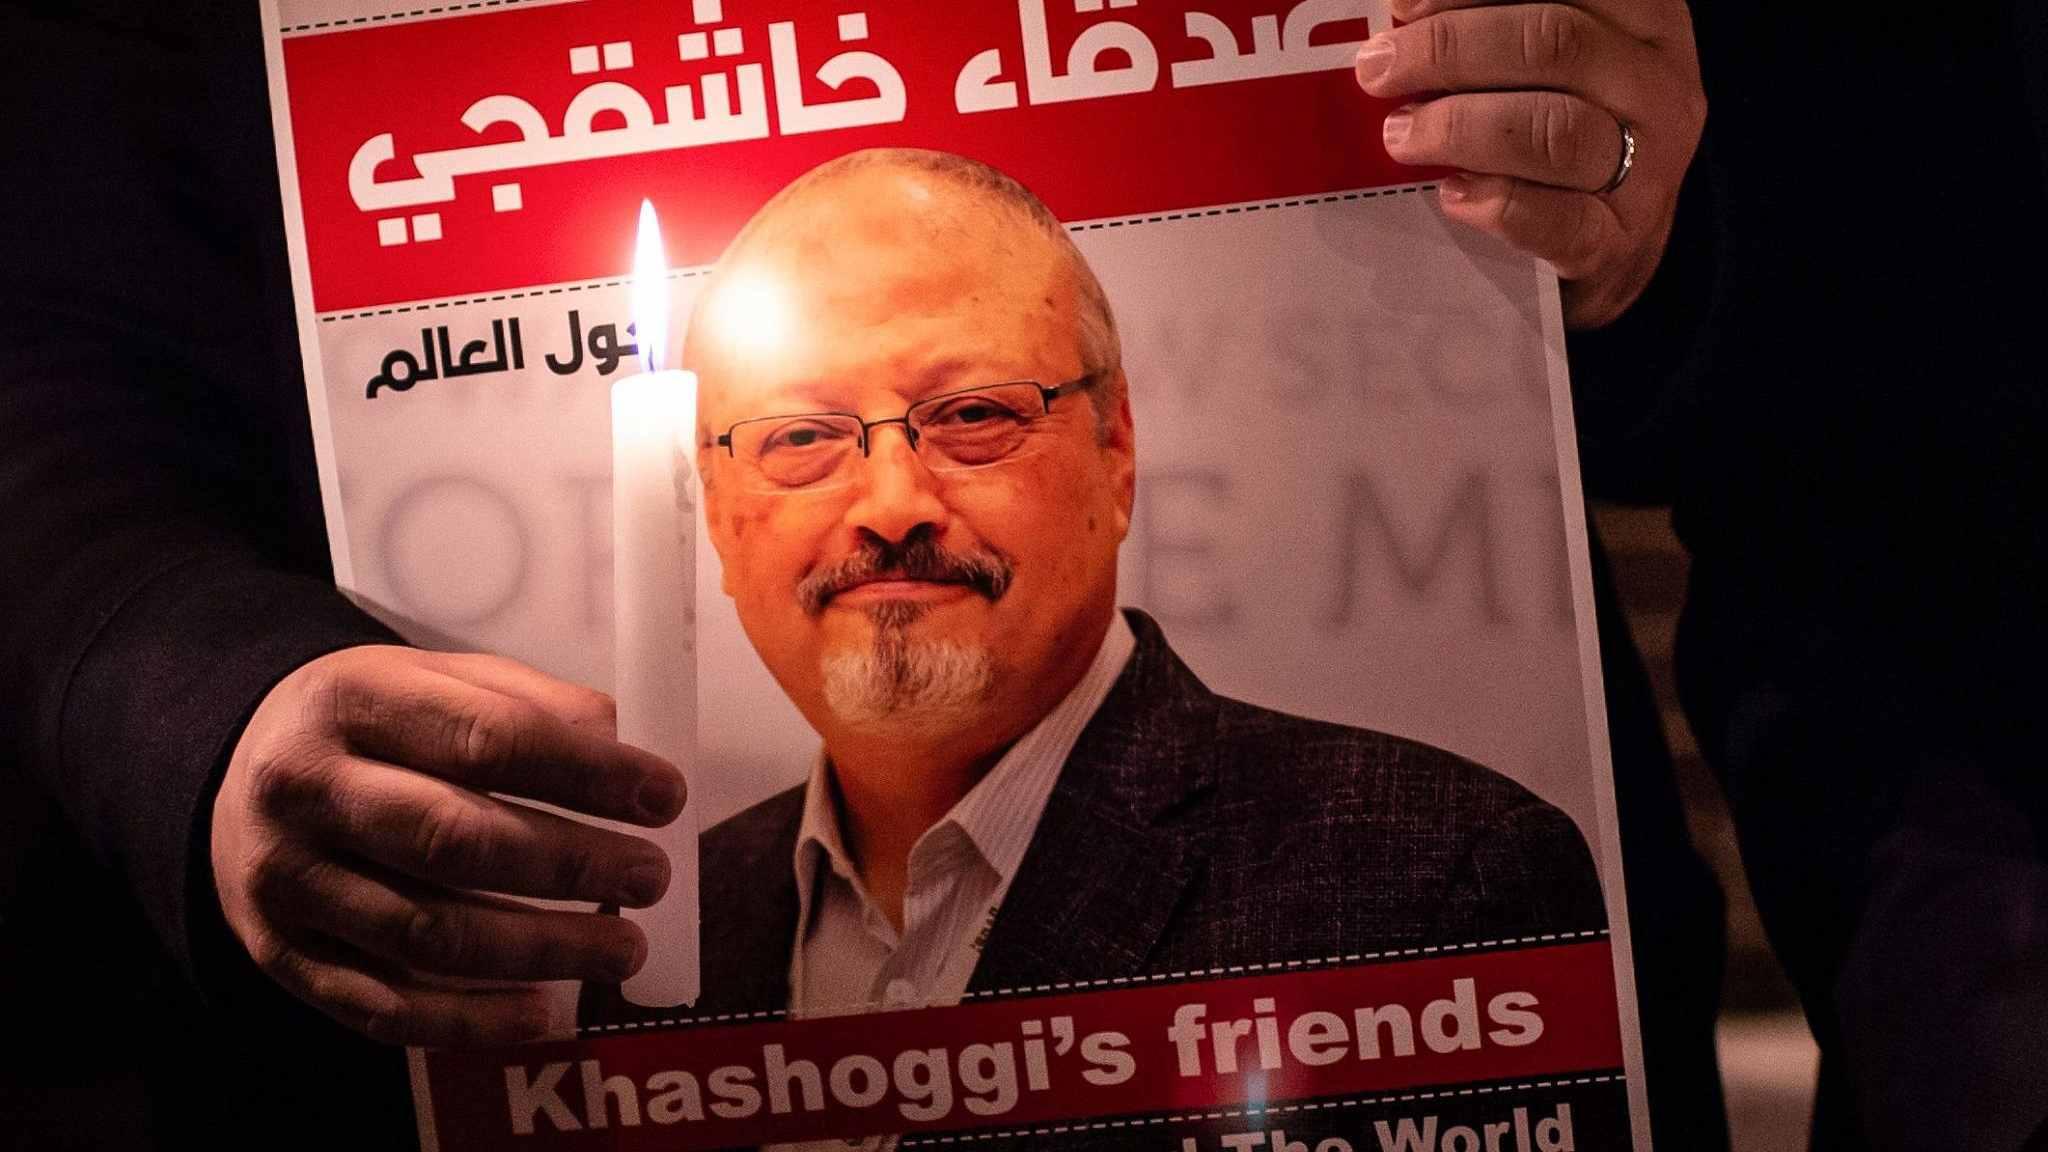 Sons of Saudi journalist Khashoggi appeal for return of his body